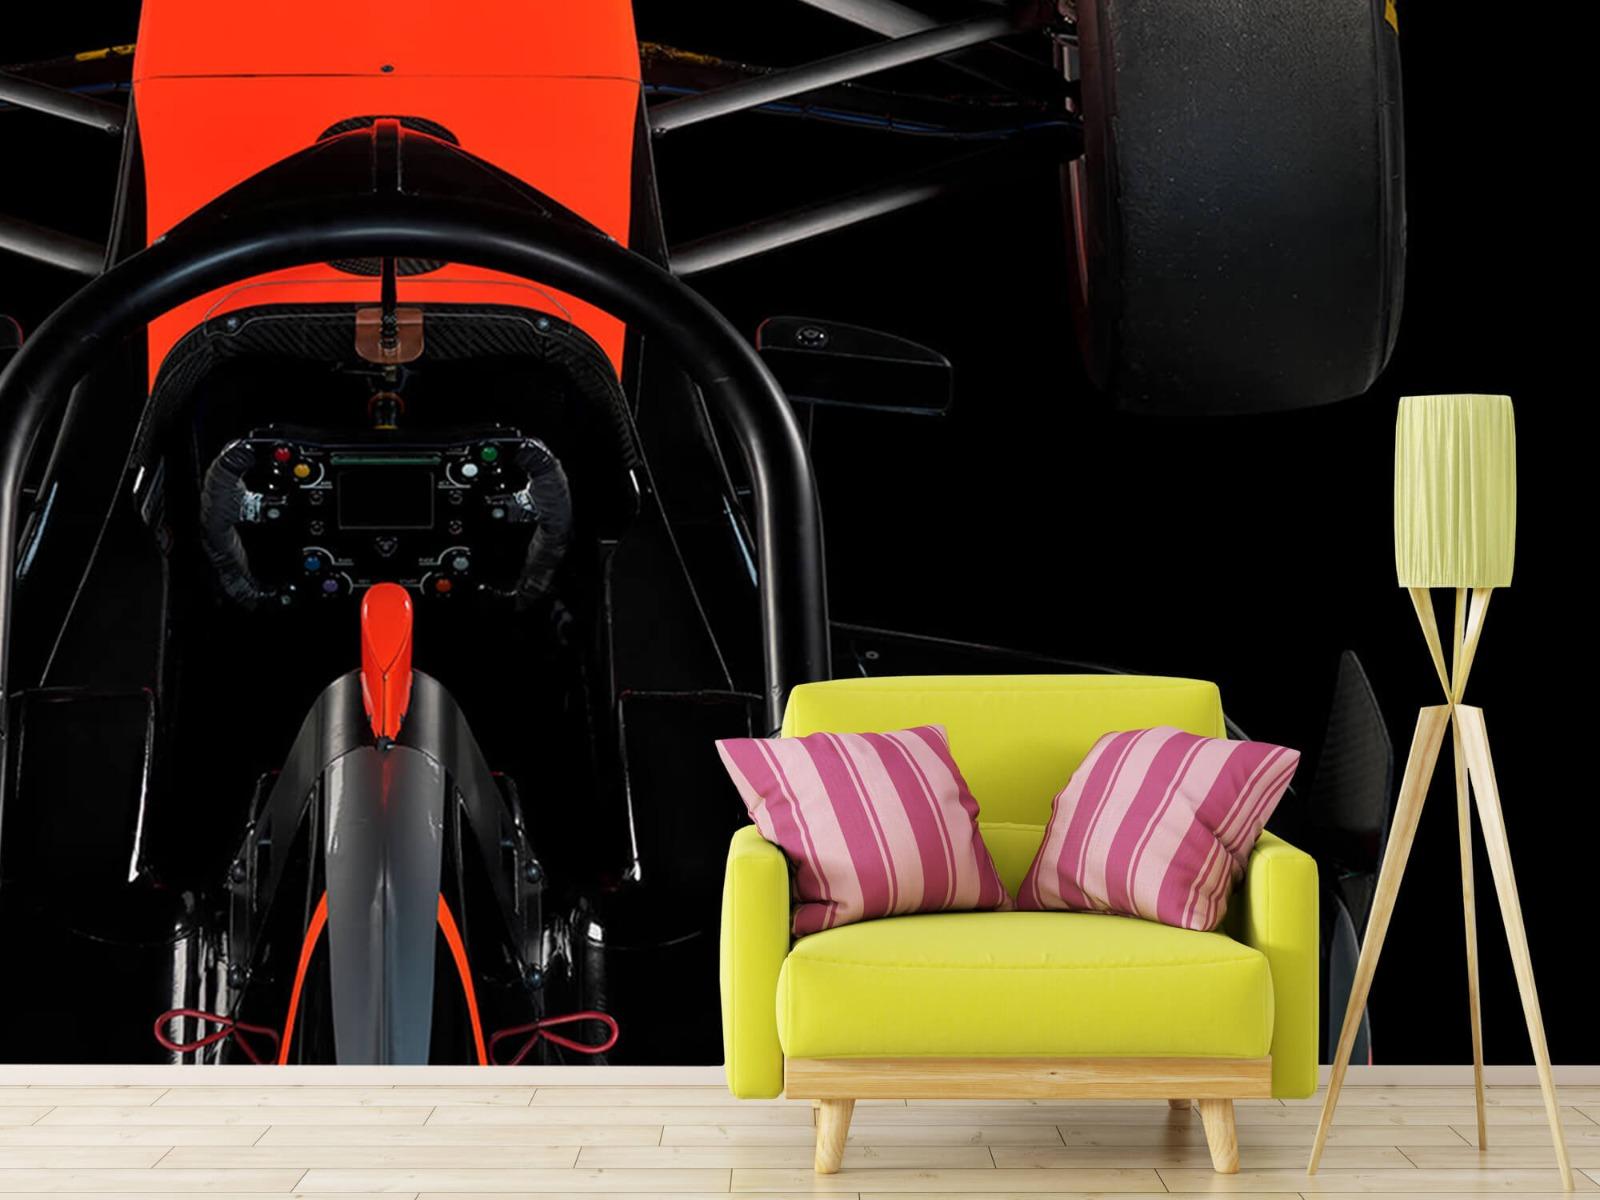 Sportauto's - Formule 3 - Cockpit view - dark - Tienerkamer 17